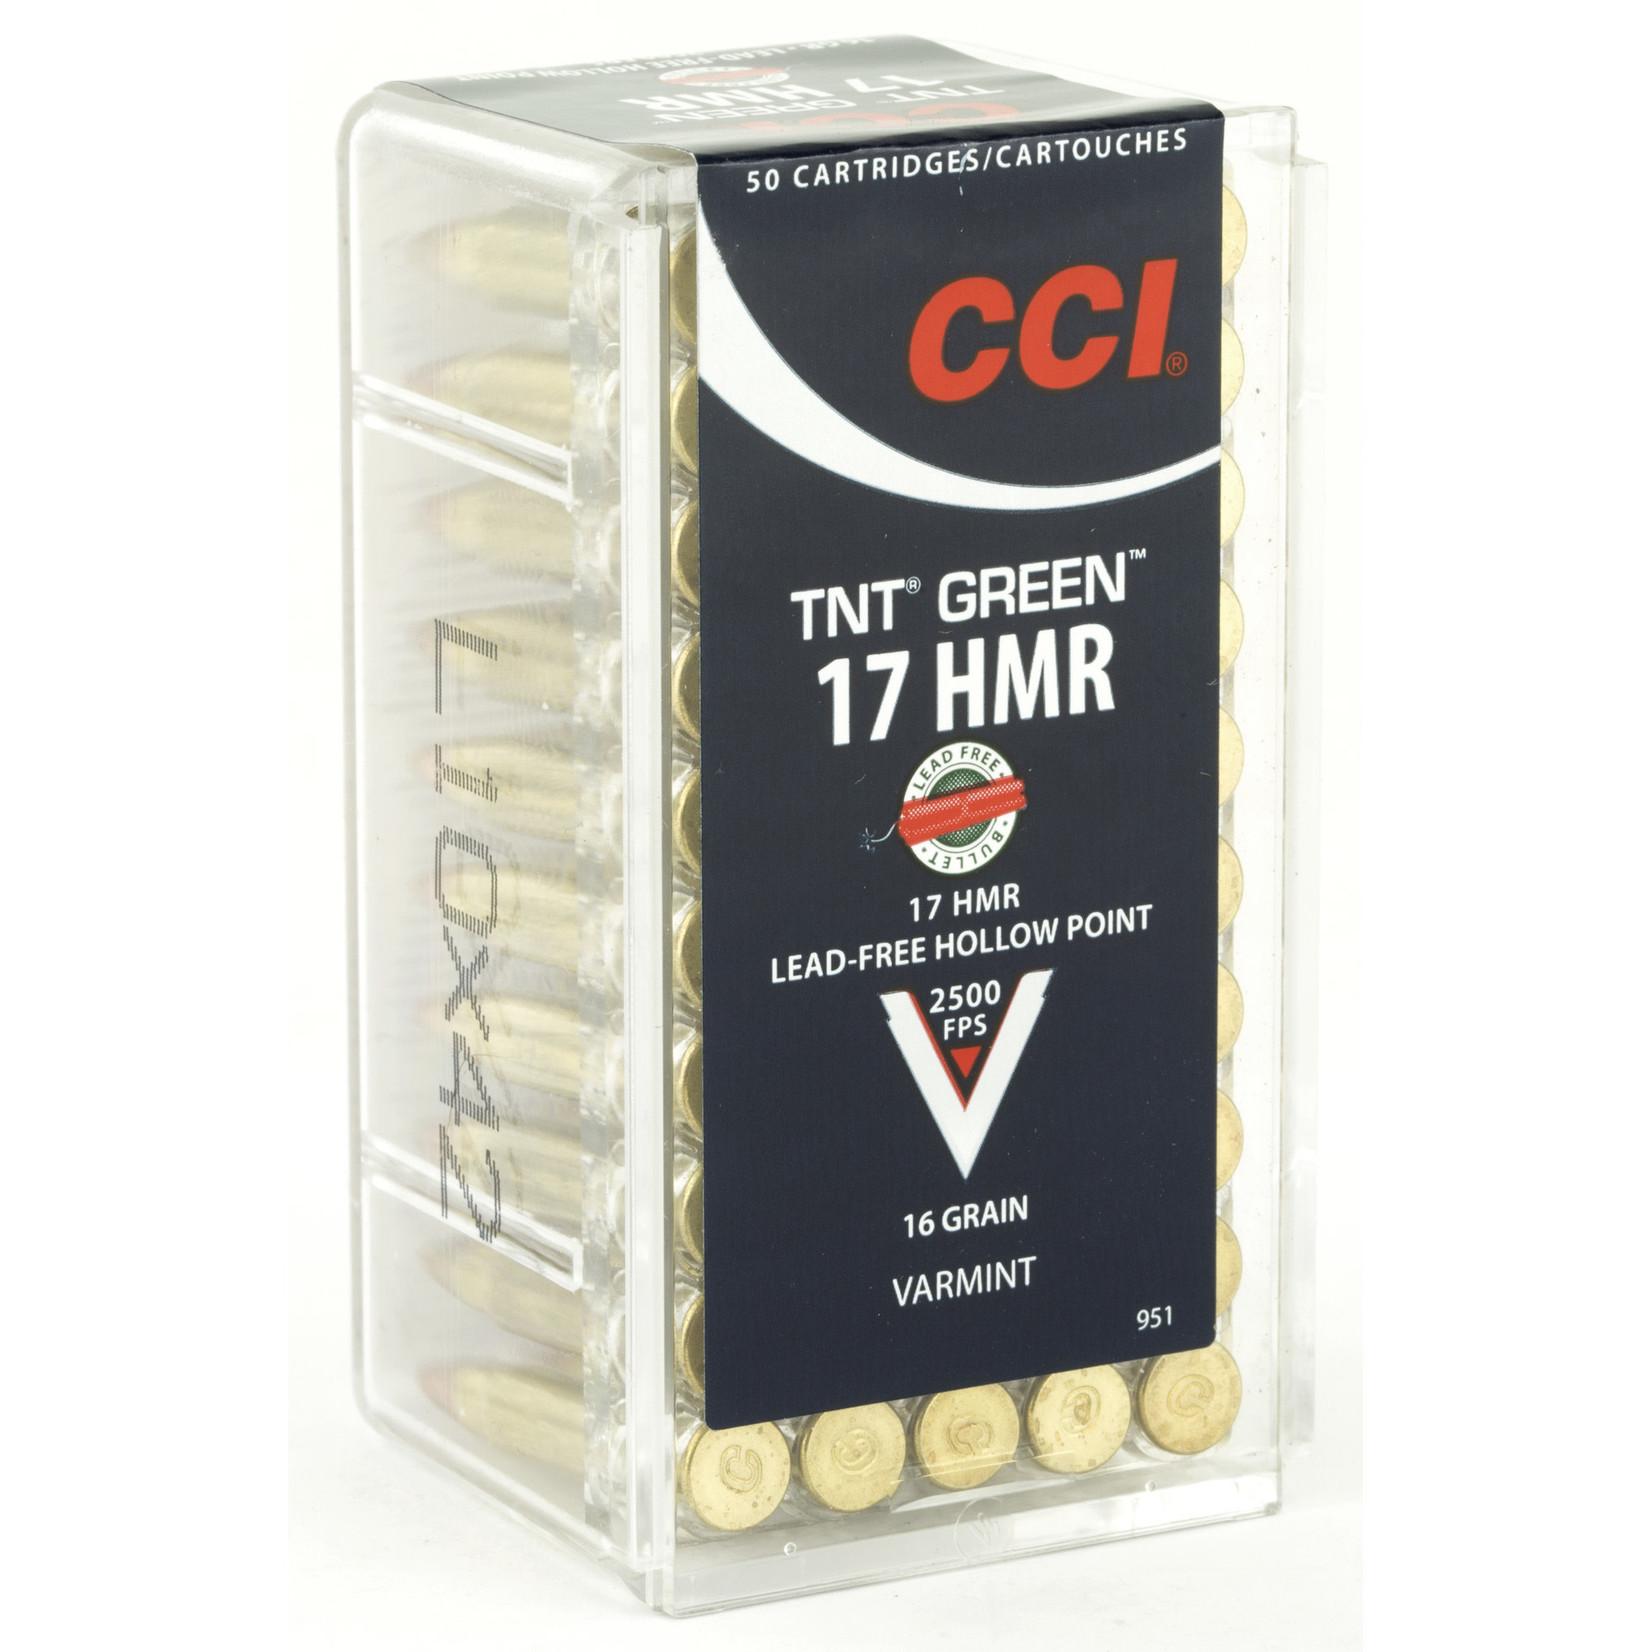 CCI/Speer CCI, TNTGreen, 17 HMR, 16 Grain, Hollow Point, Lead Free, 50 Round Box,